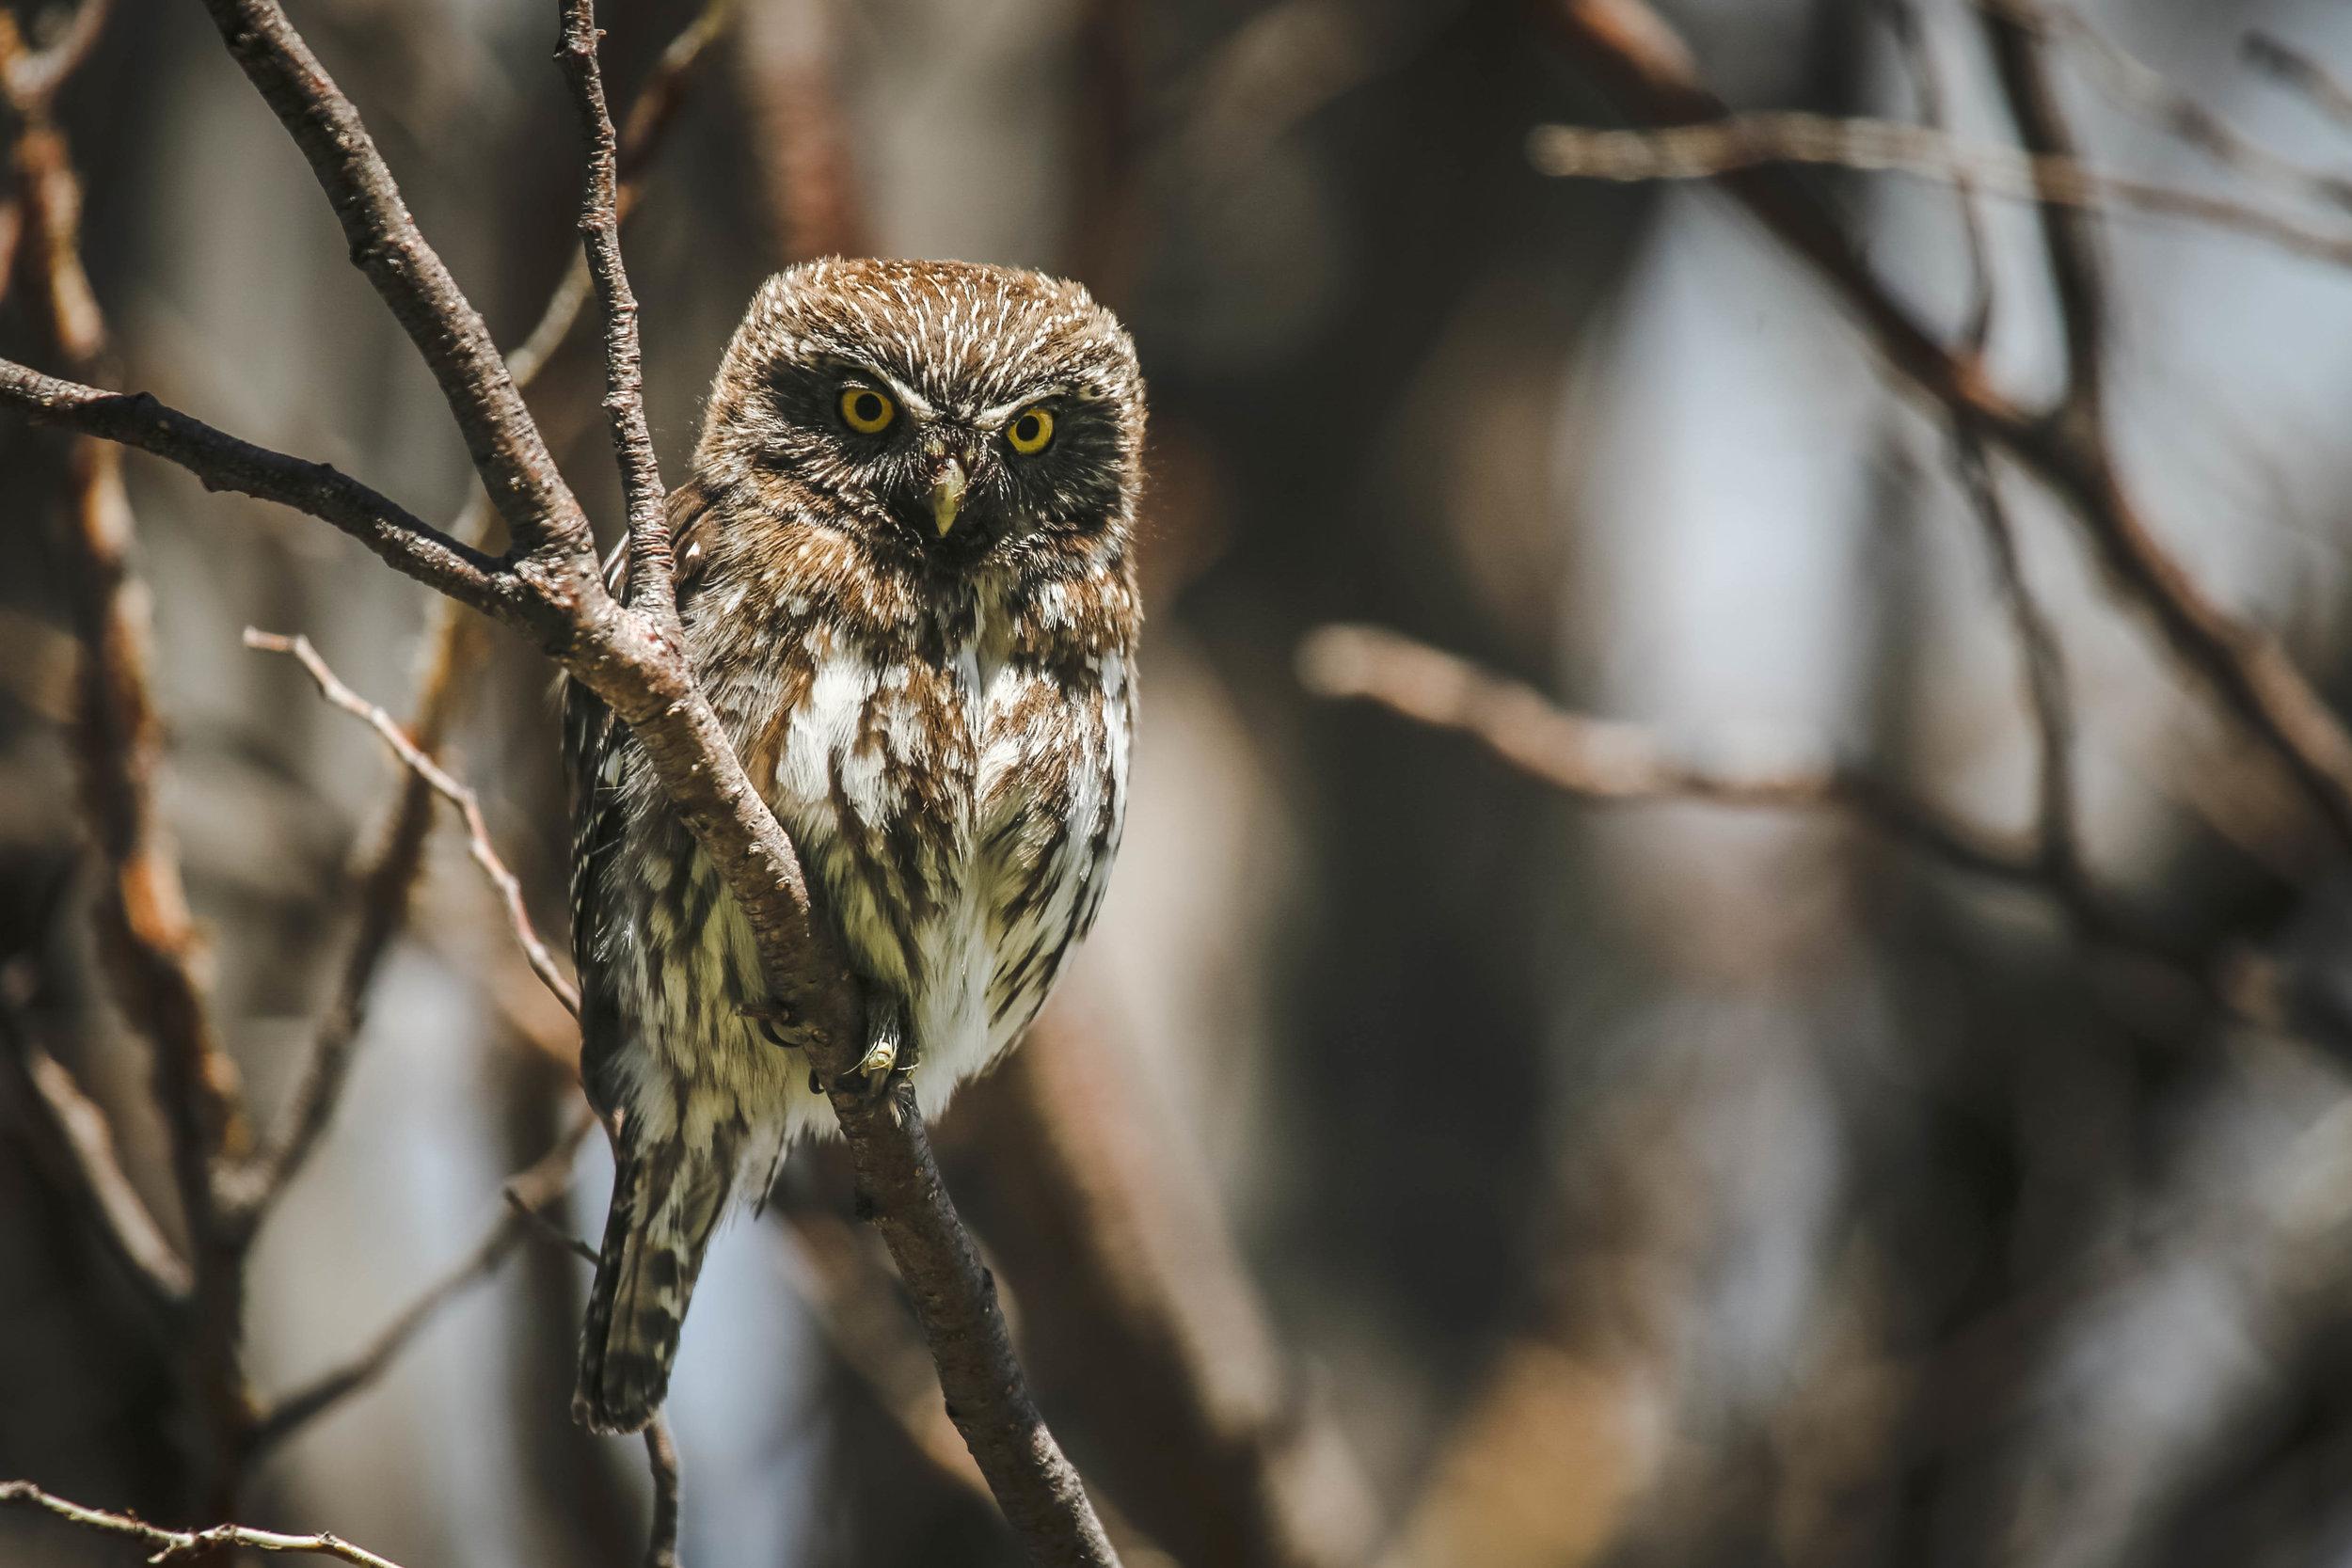 Pigmy Owl – Patagonia, Chile